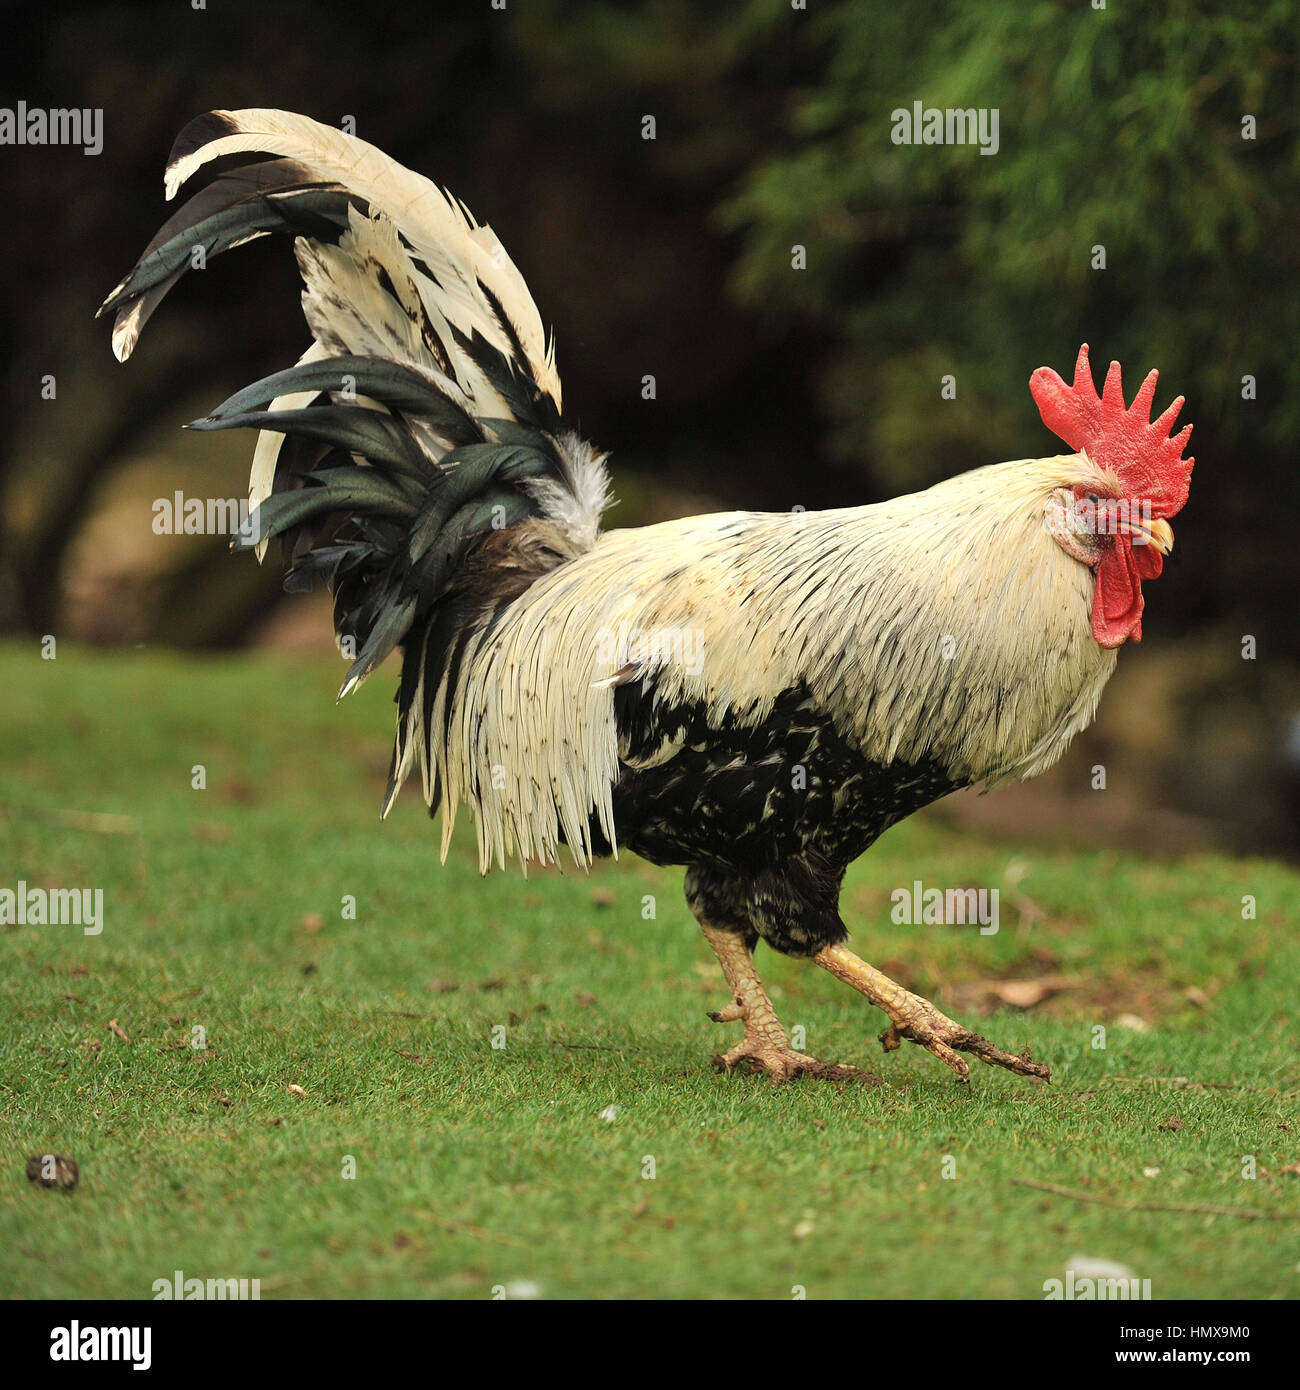 pekin rooster - Stock Image